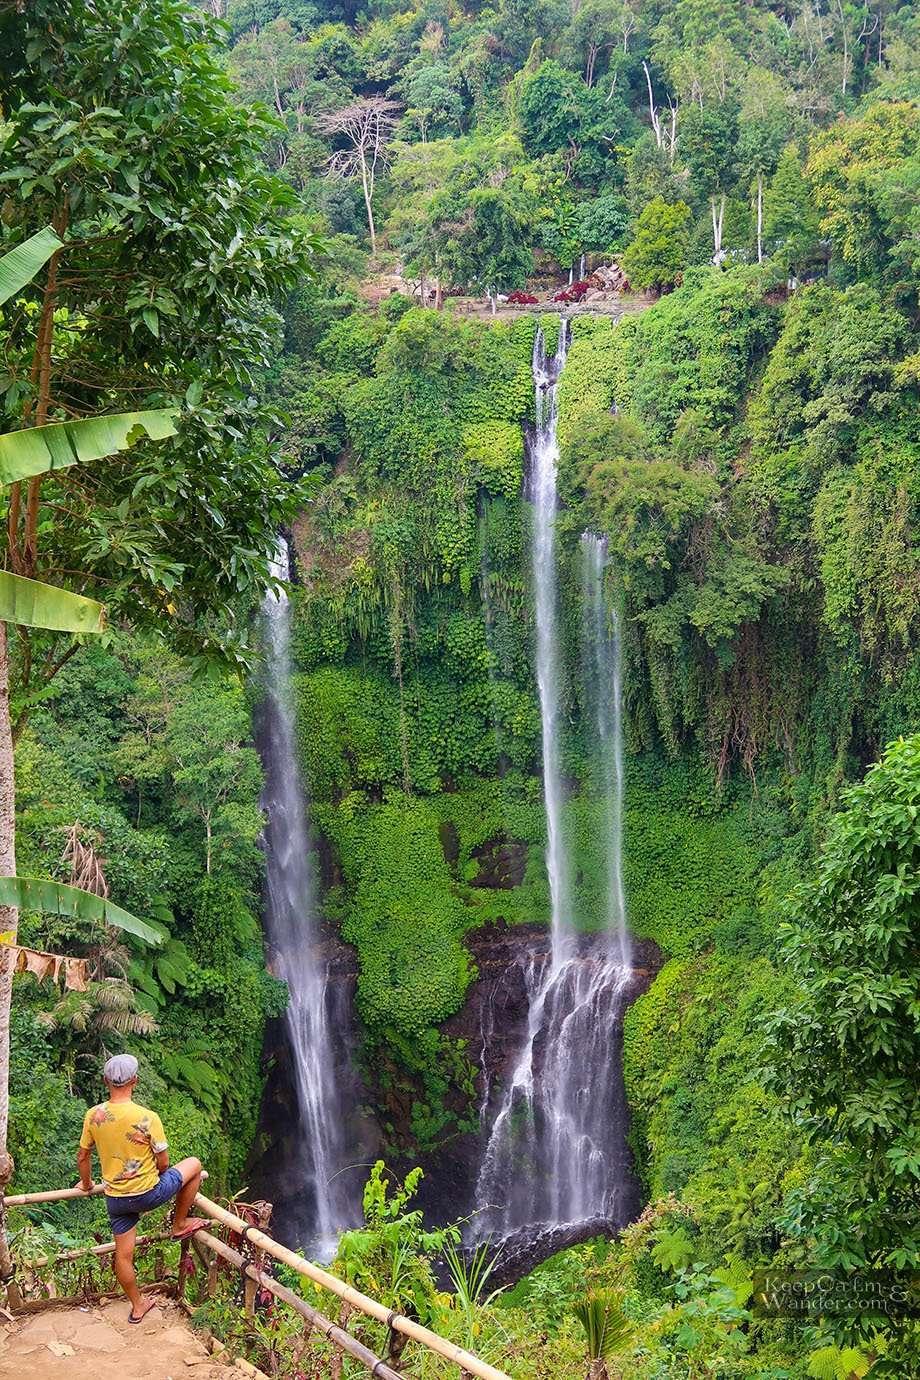 Sekumpul Waterfall - Bali's Best Waterfall?